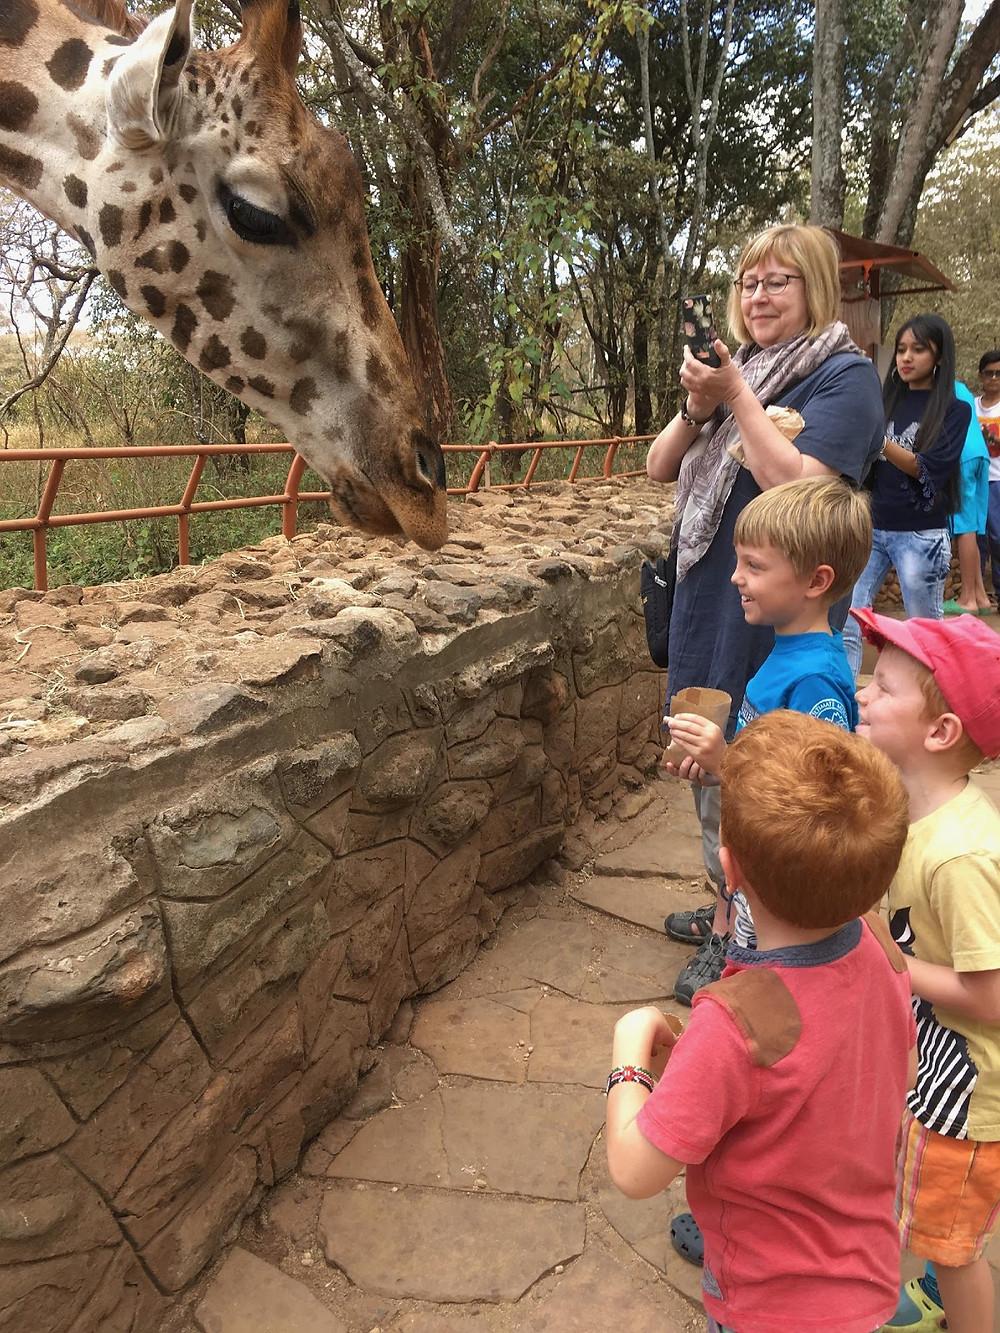 The Giraffe Sanctuary